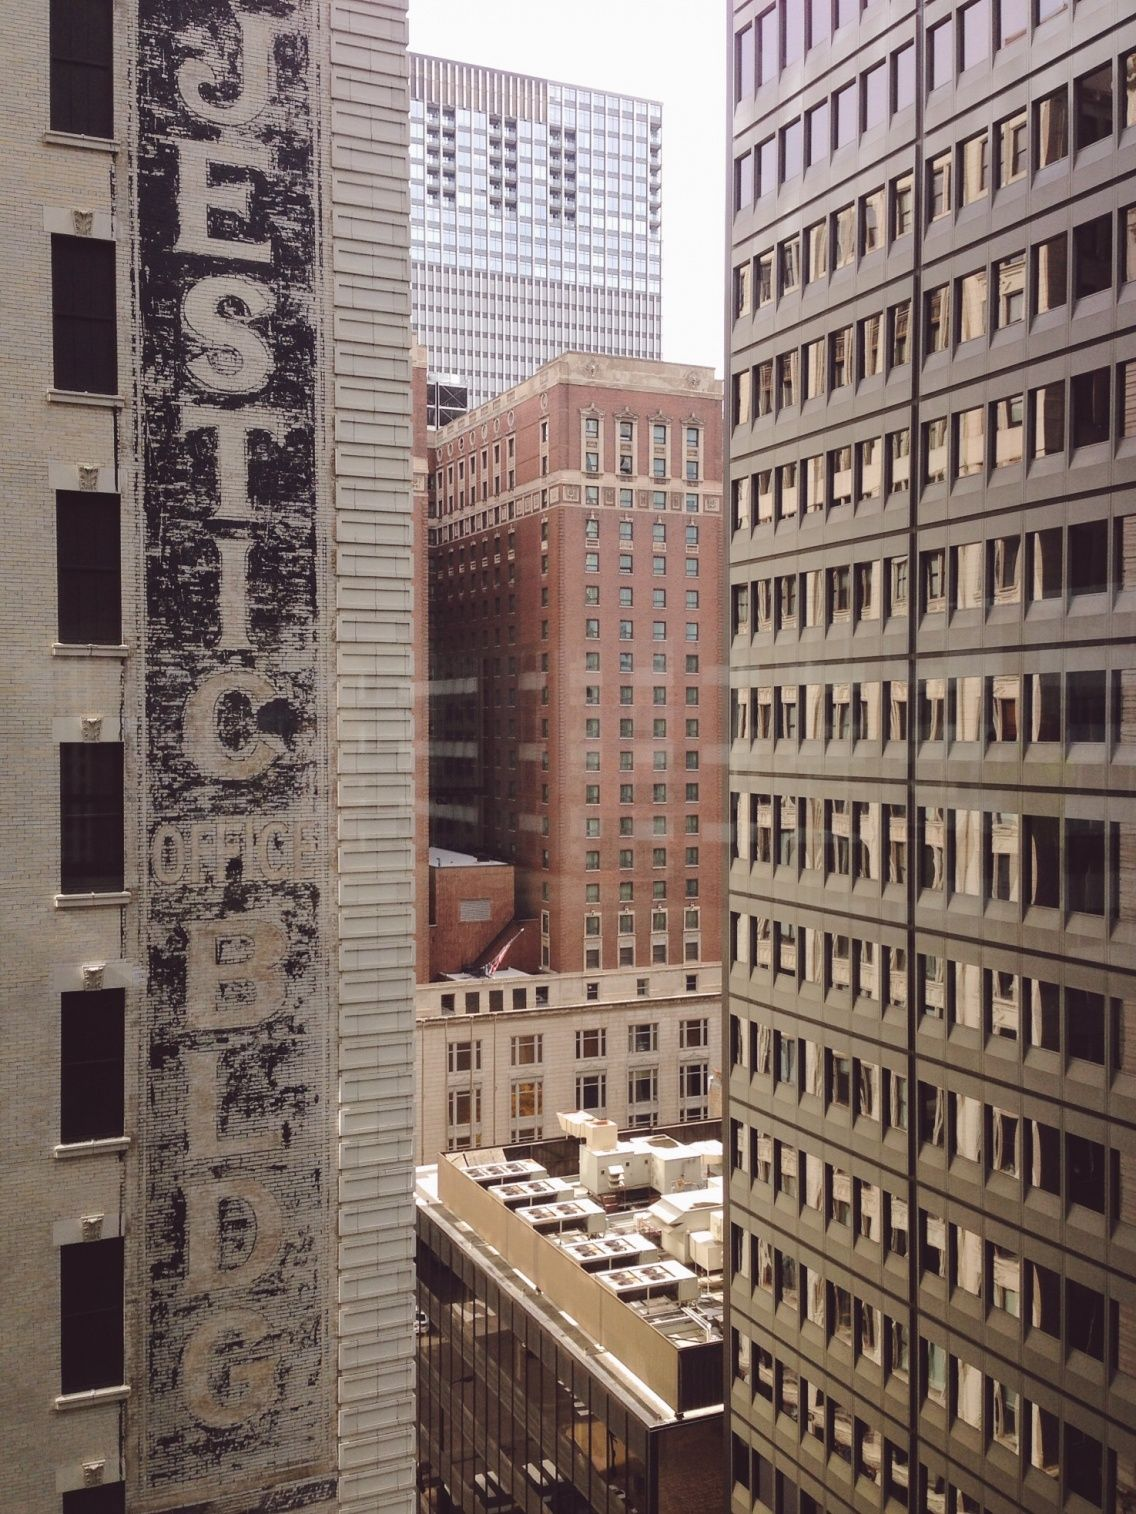 Chicago / photo by John K. Zacherle